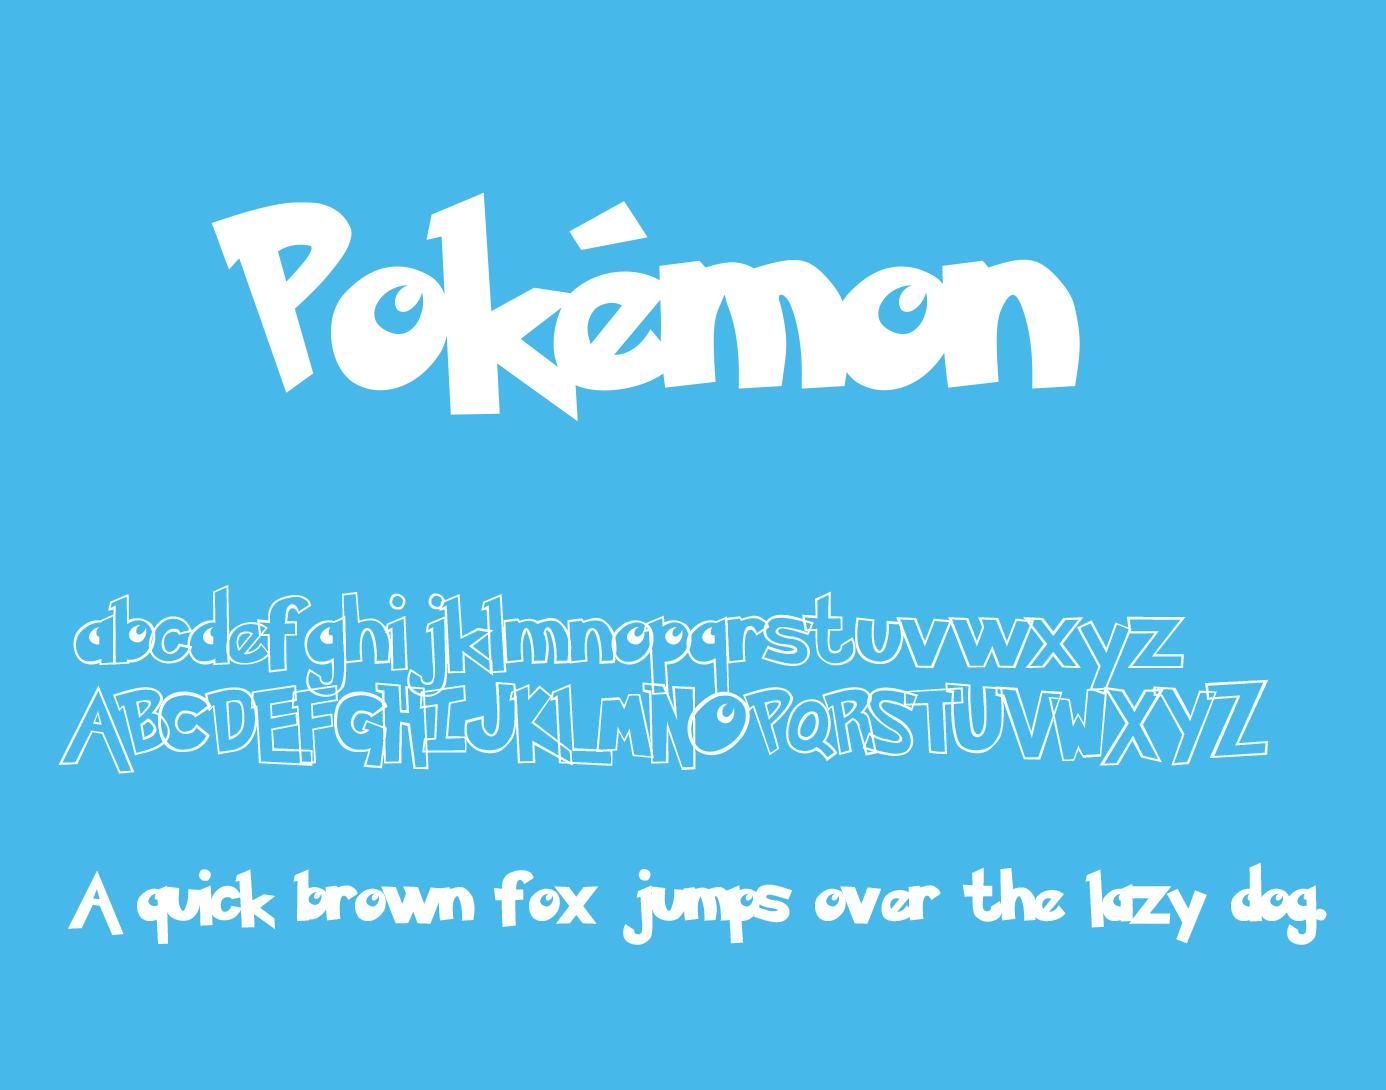 https://fontclarity.com/wp-content/uploads/2019/09/pokémon-font-download-0.png Free Download